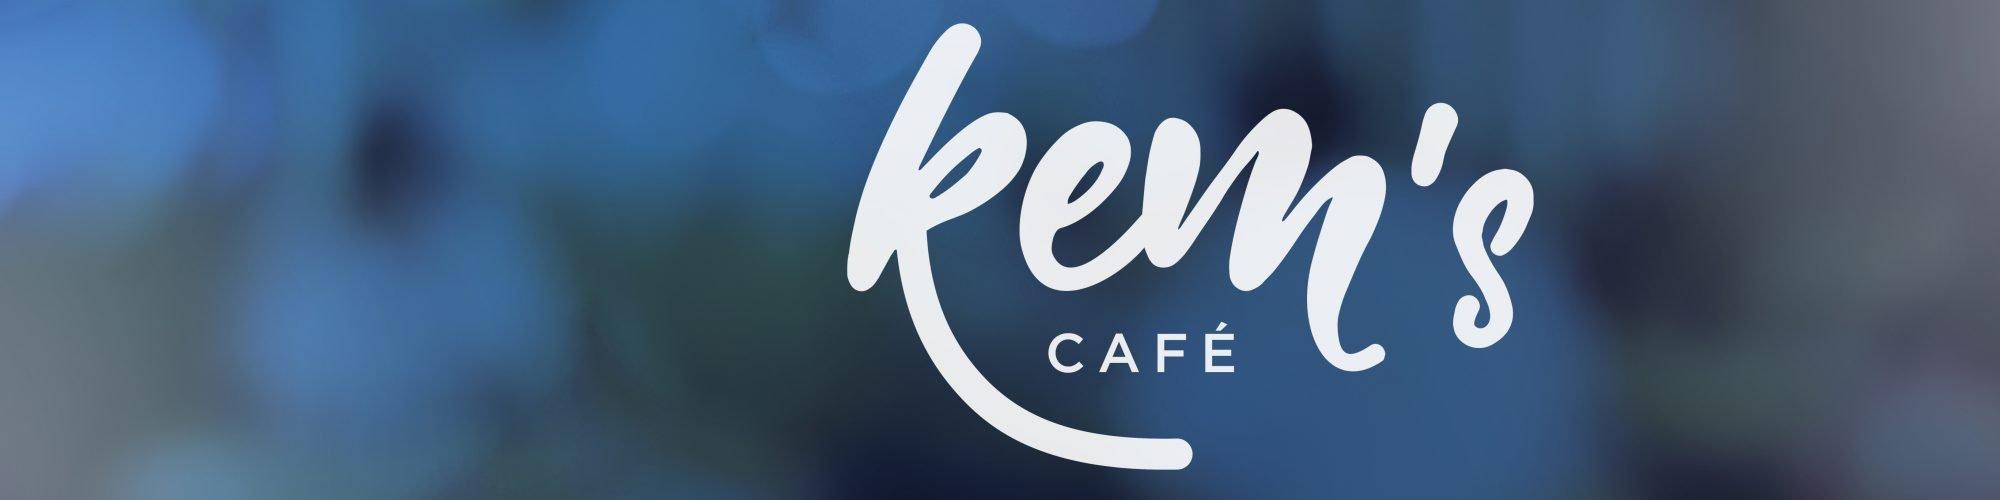 kem's cafe Huttrop